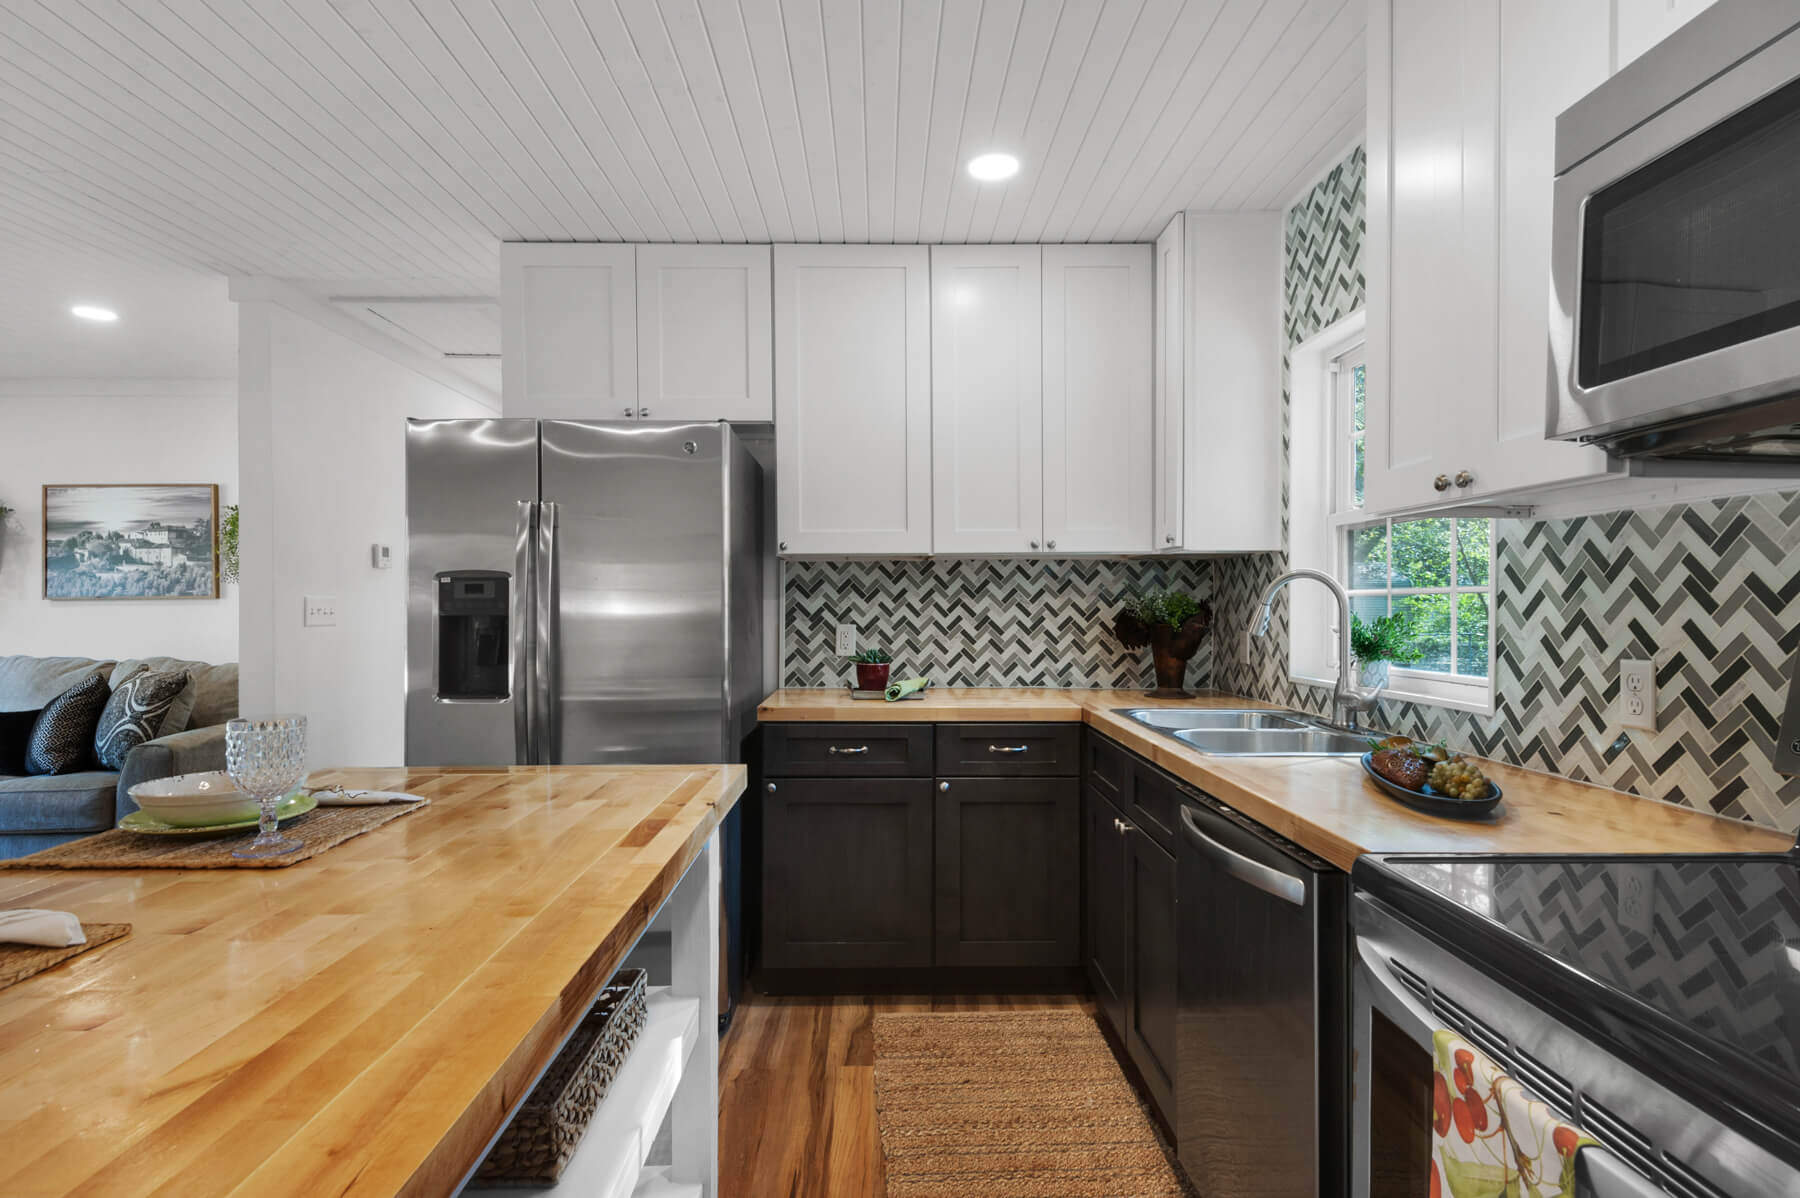 movetobaldwincounty.com Urban Property https://movetobaldwincounty.com/listings/317-w-berry-avenue-foley-al-36535-for-sale/